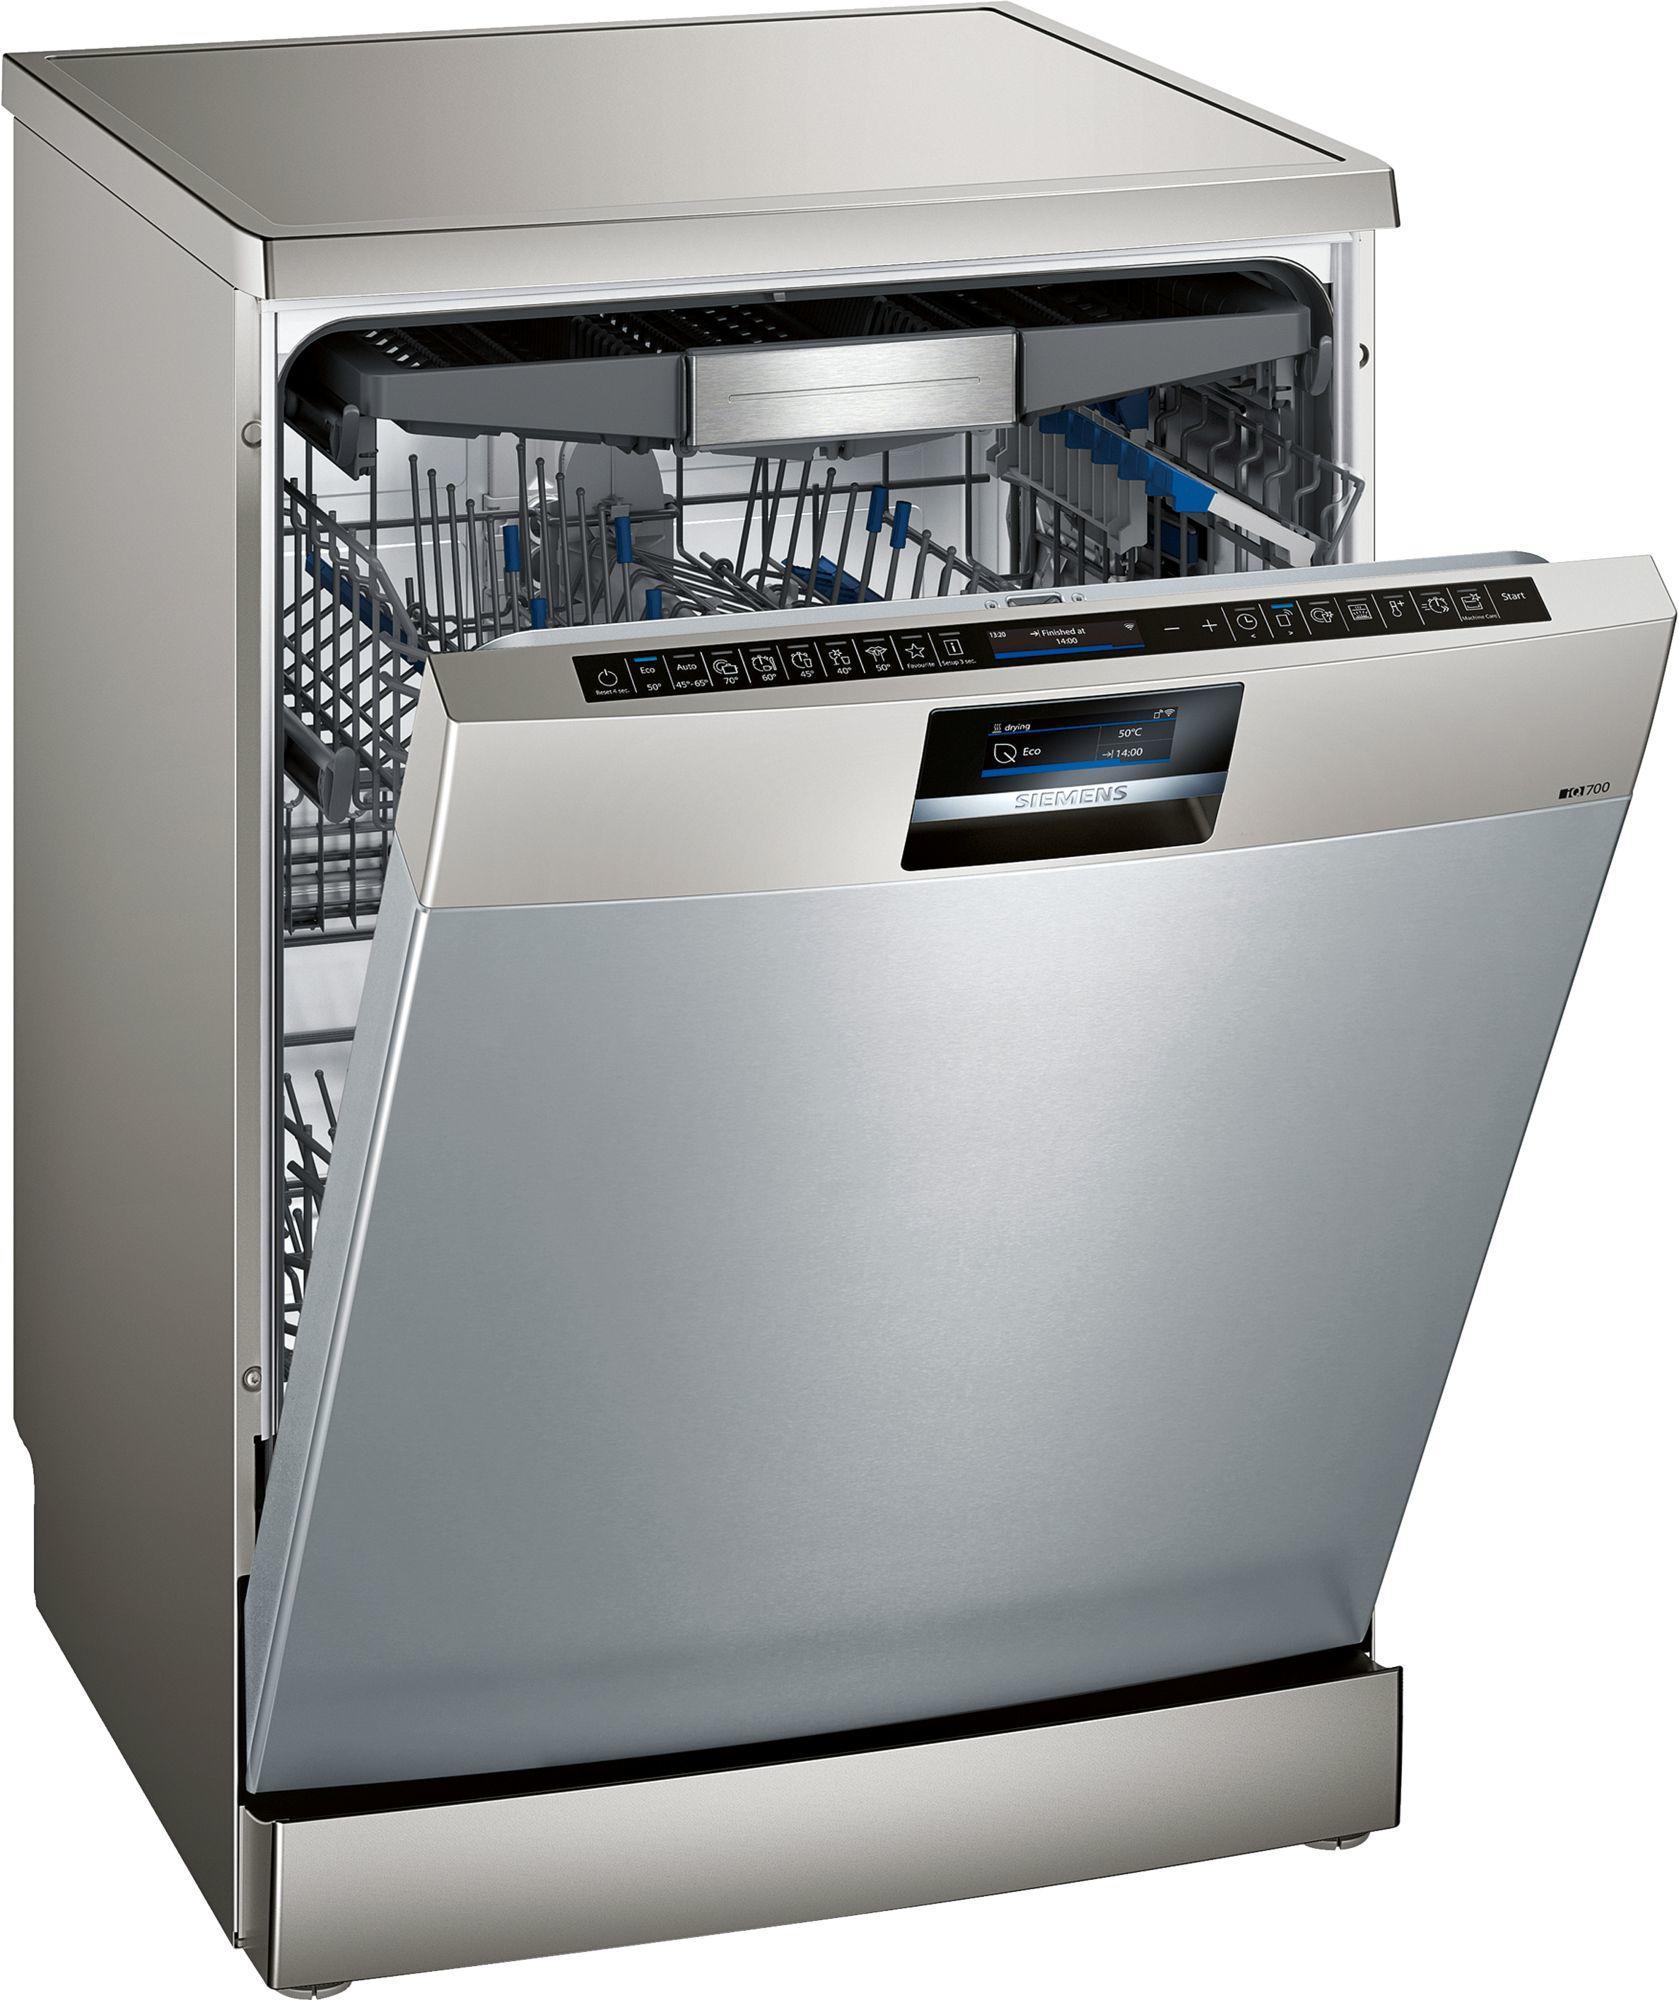 Image of iQ700 SN27YI01CE 60cm Standard Dishwasher | Fingerprint Free Steel